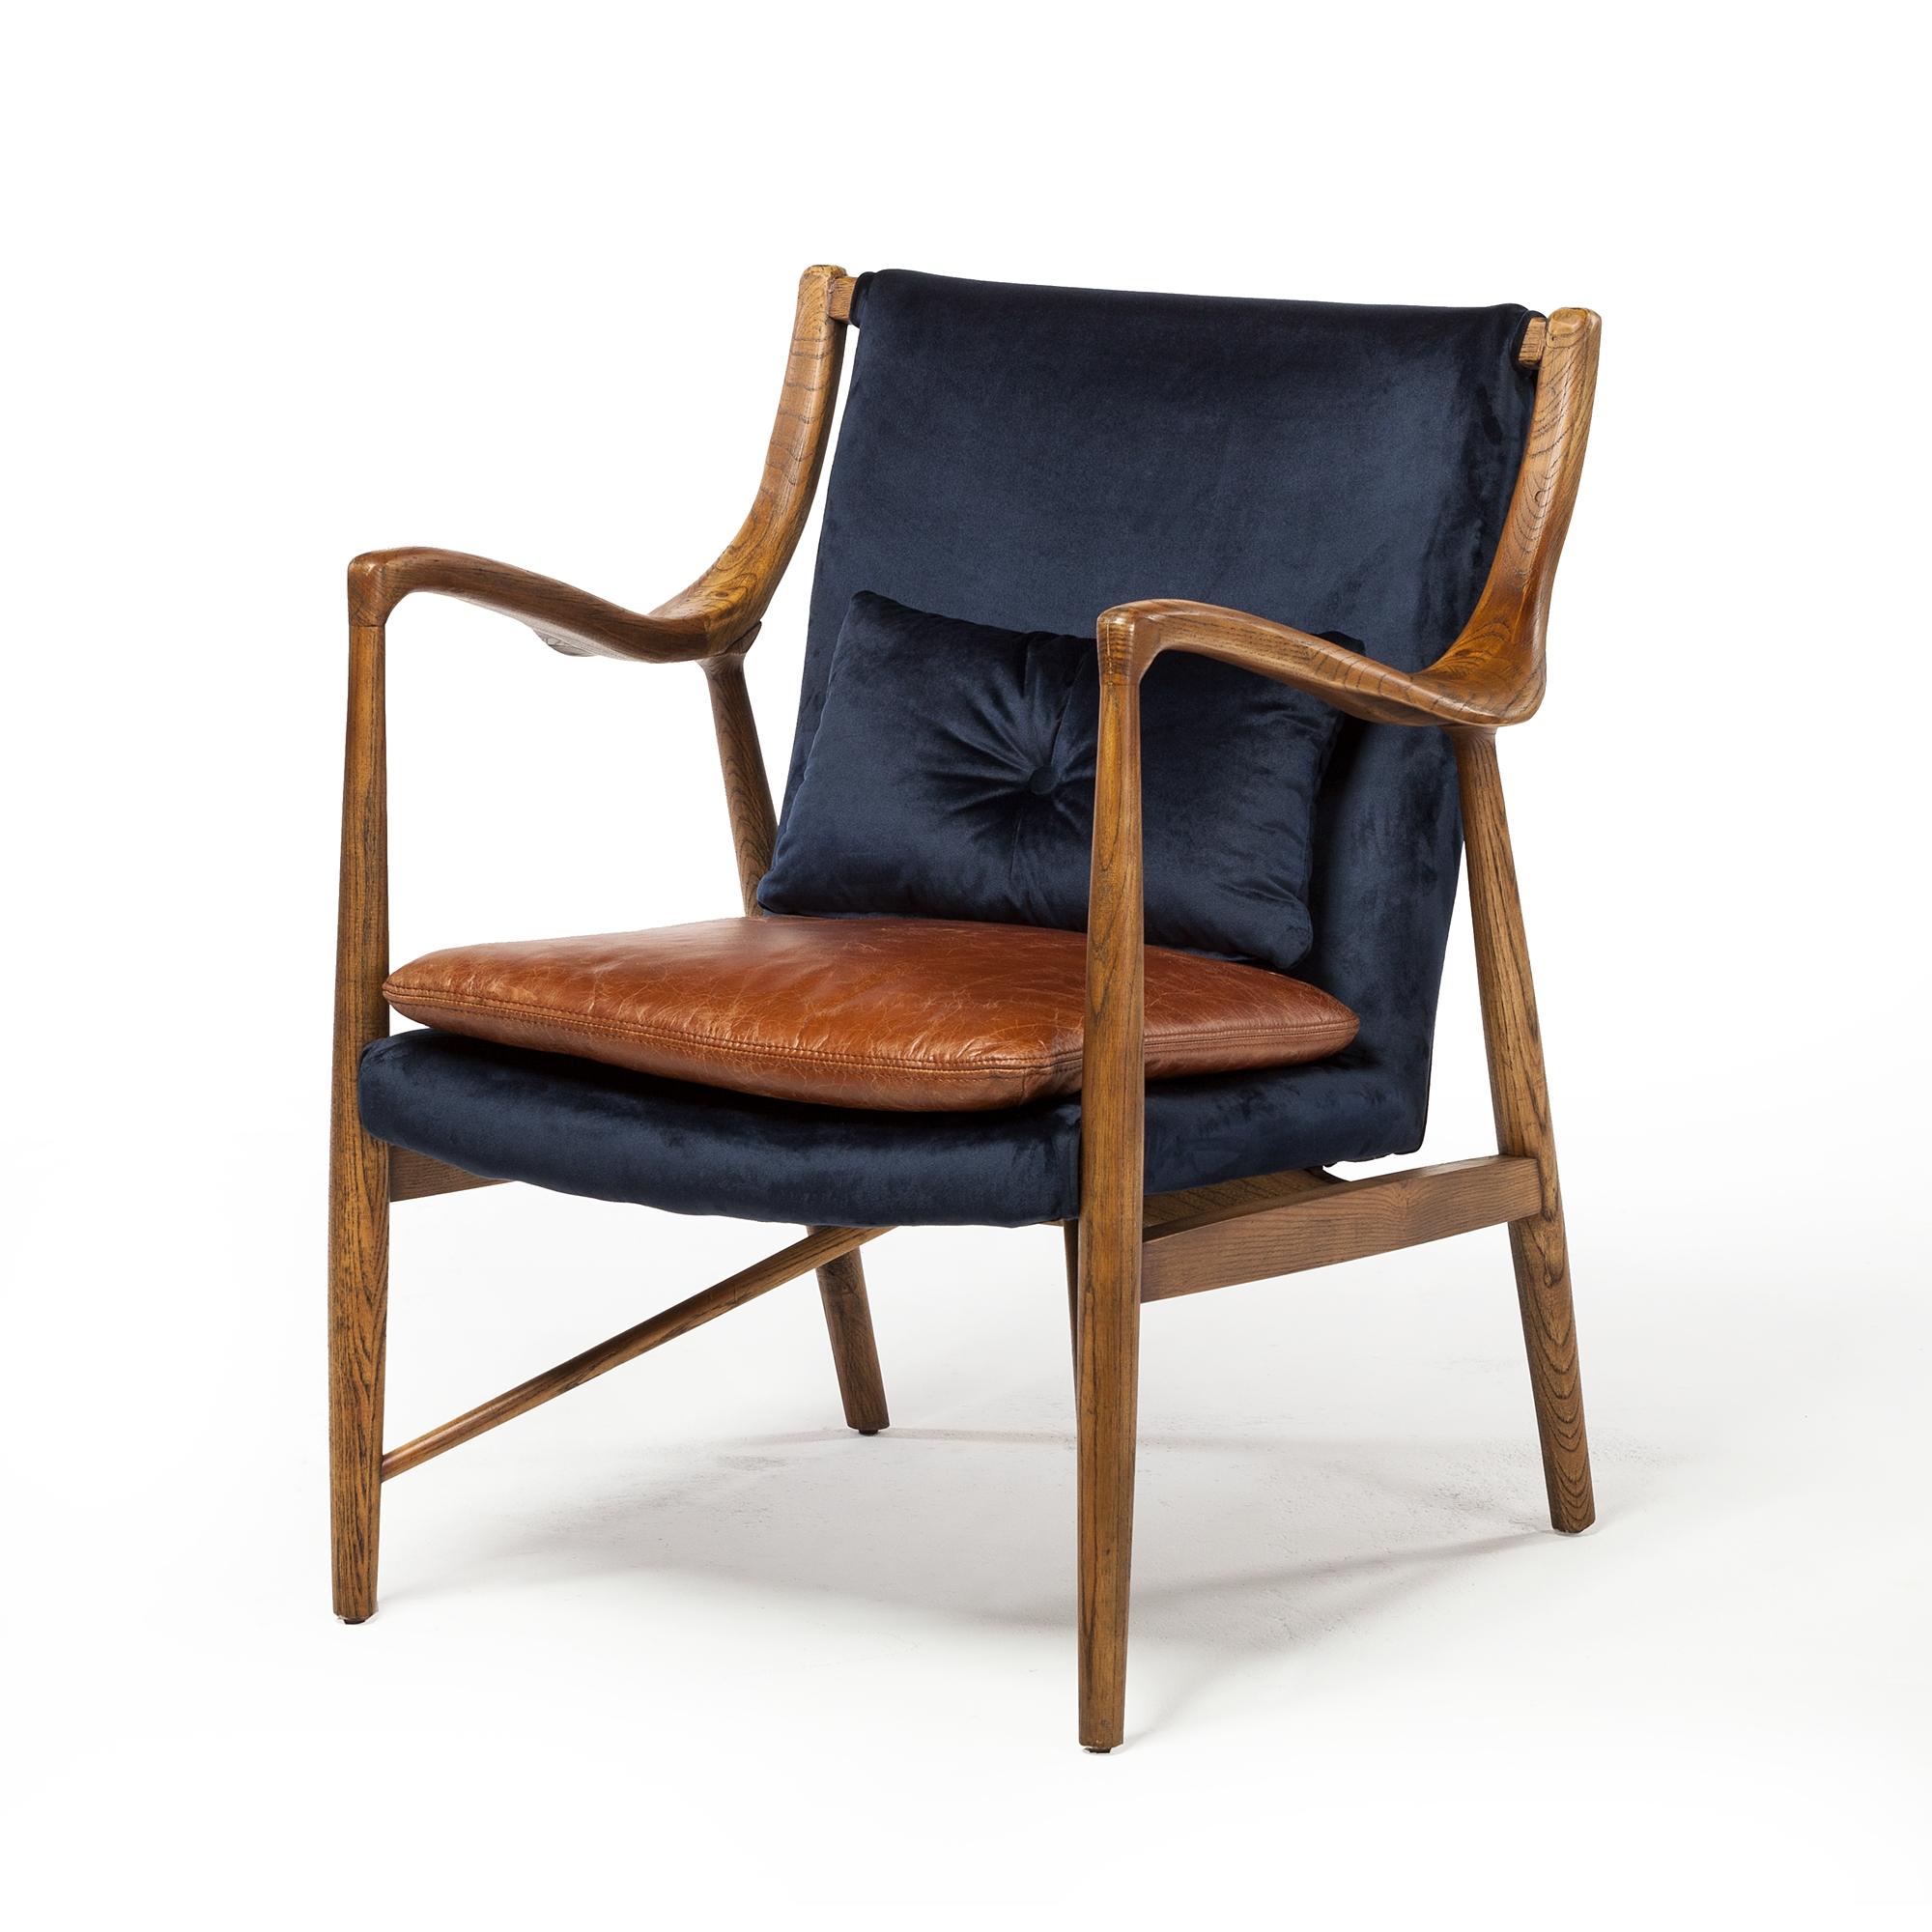 Finn juhl style 45 chair the khazana home furniture store